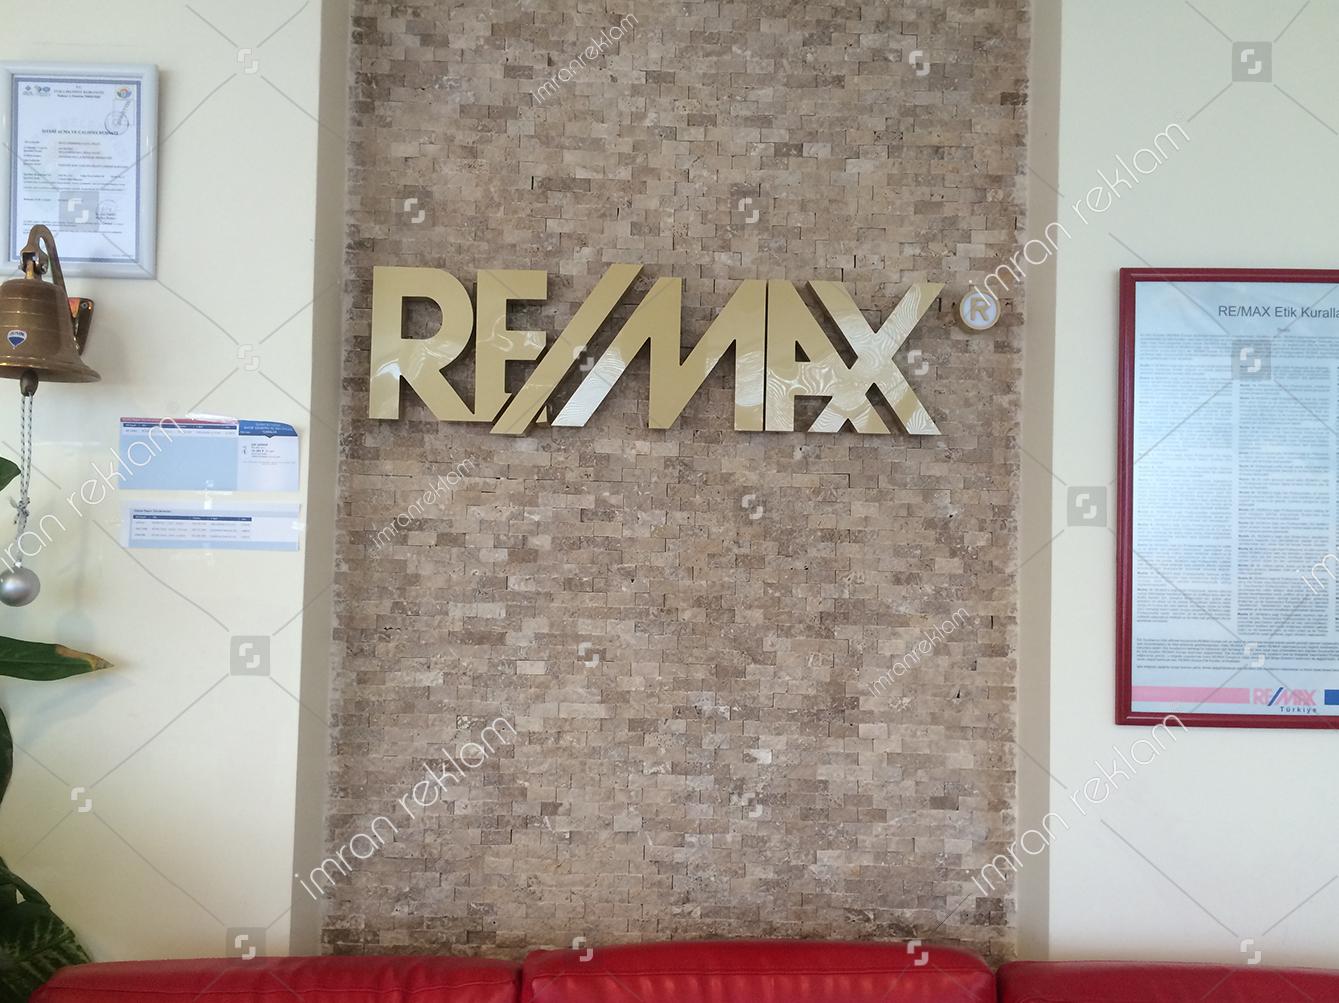 Remax krom kutu harfli banko tabelası